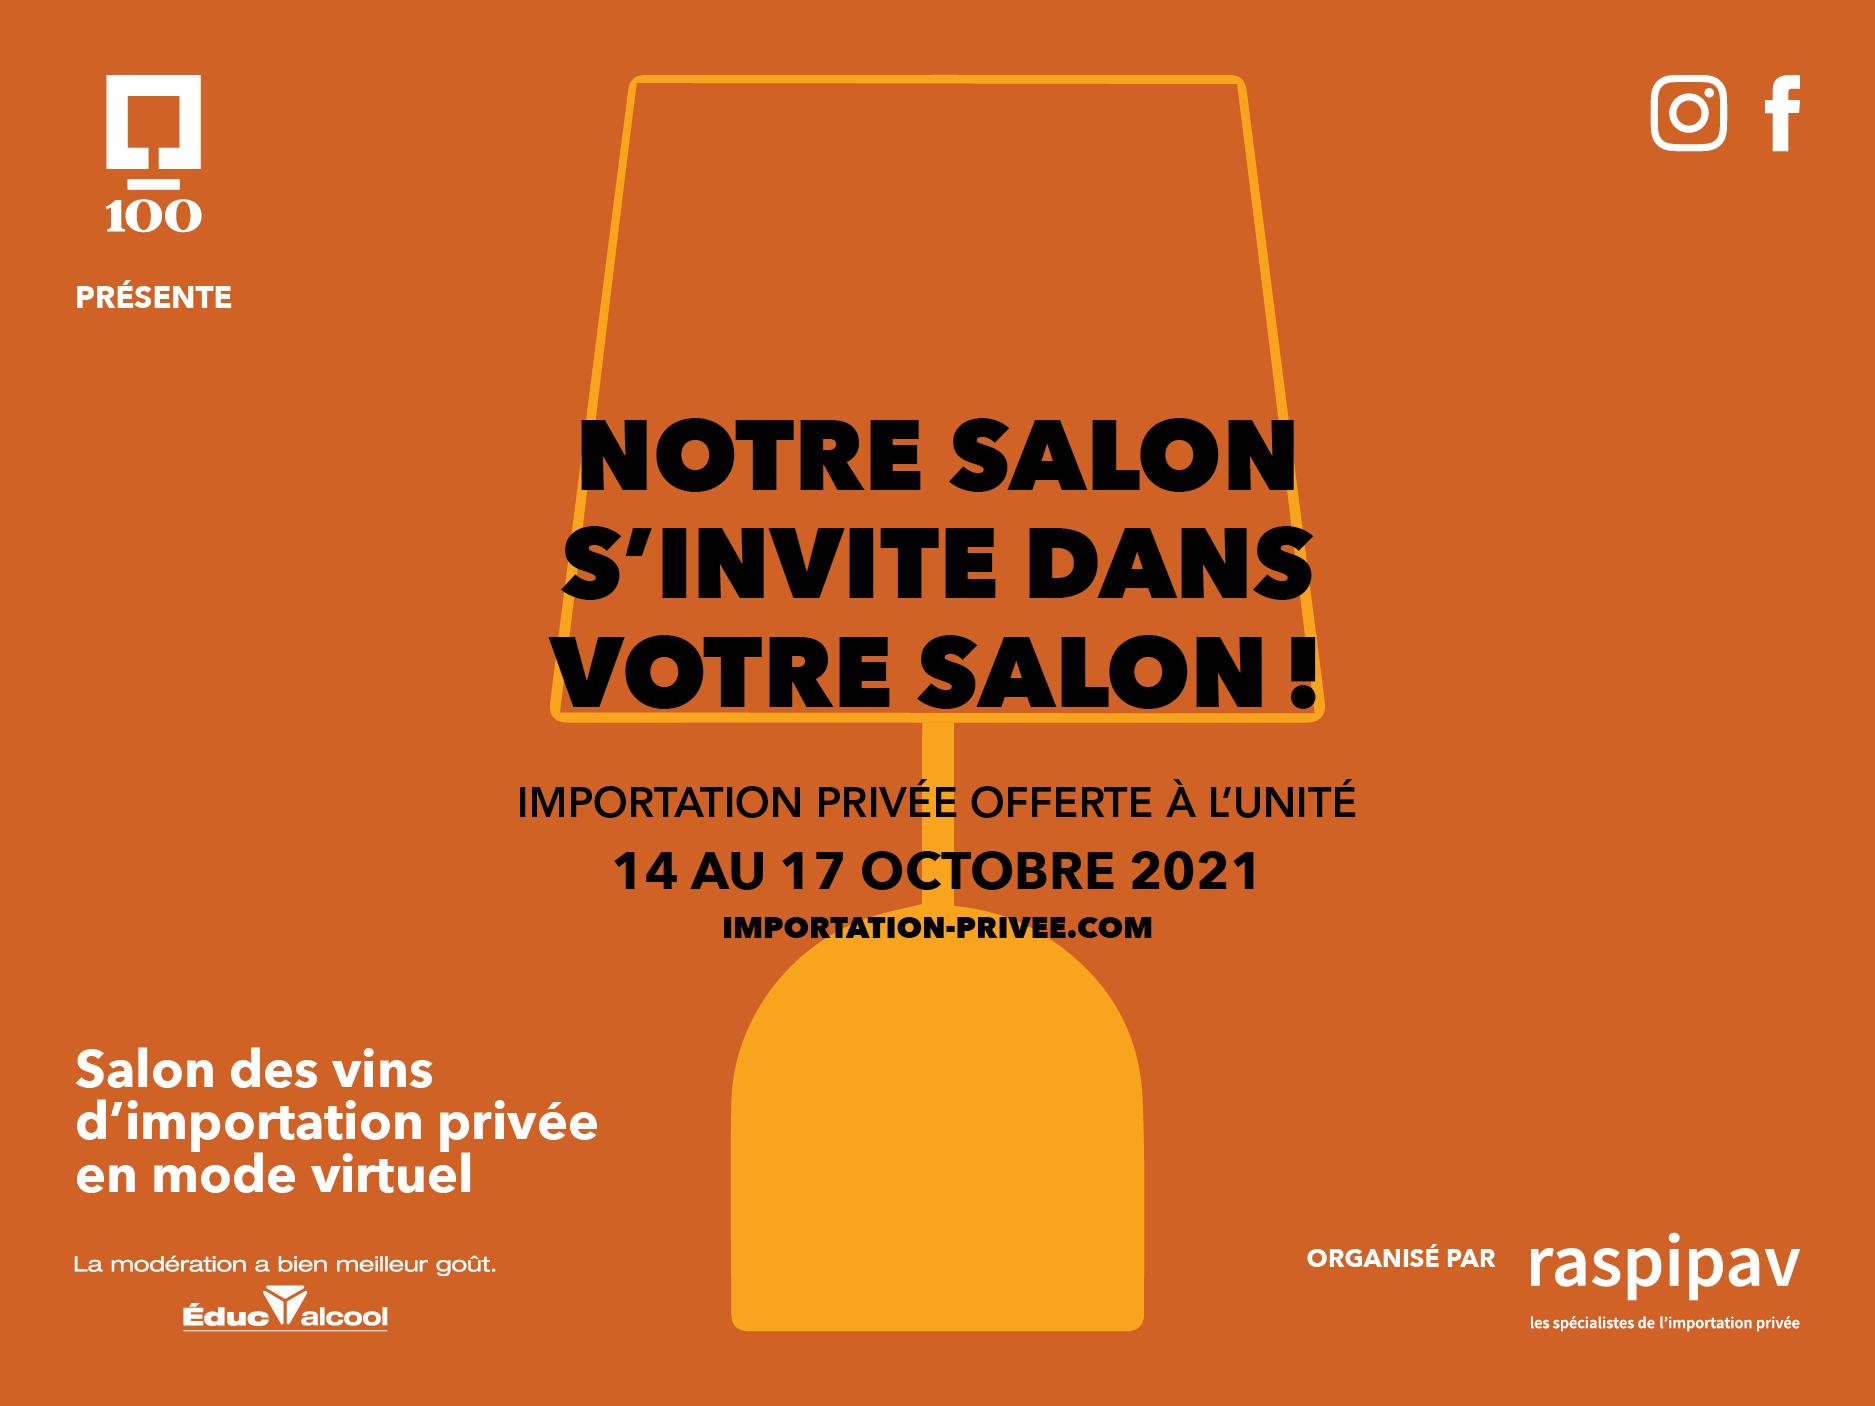 La SAQ est fière d'être partenaire de la 13e édition du RASPIPAV qui aura lieu du 14 au 17 octobre 2021.